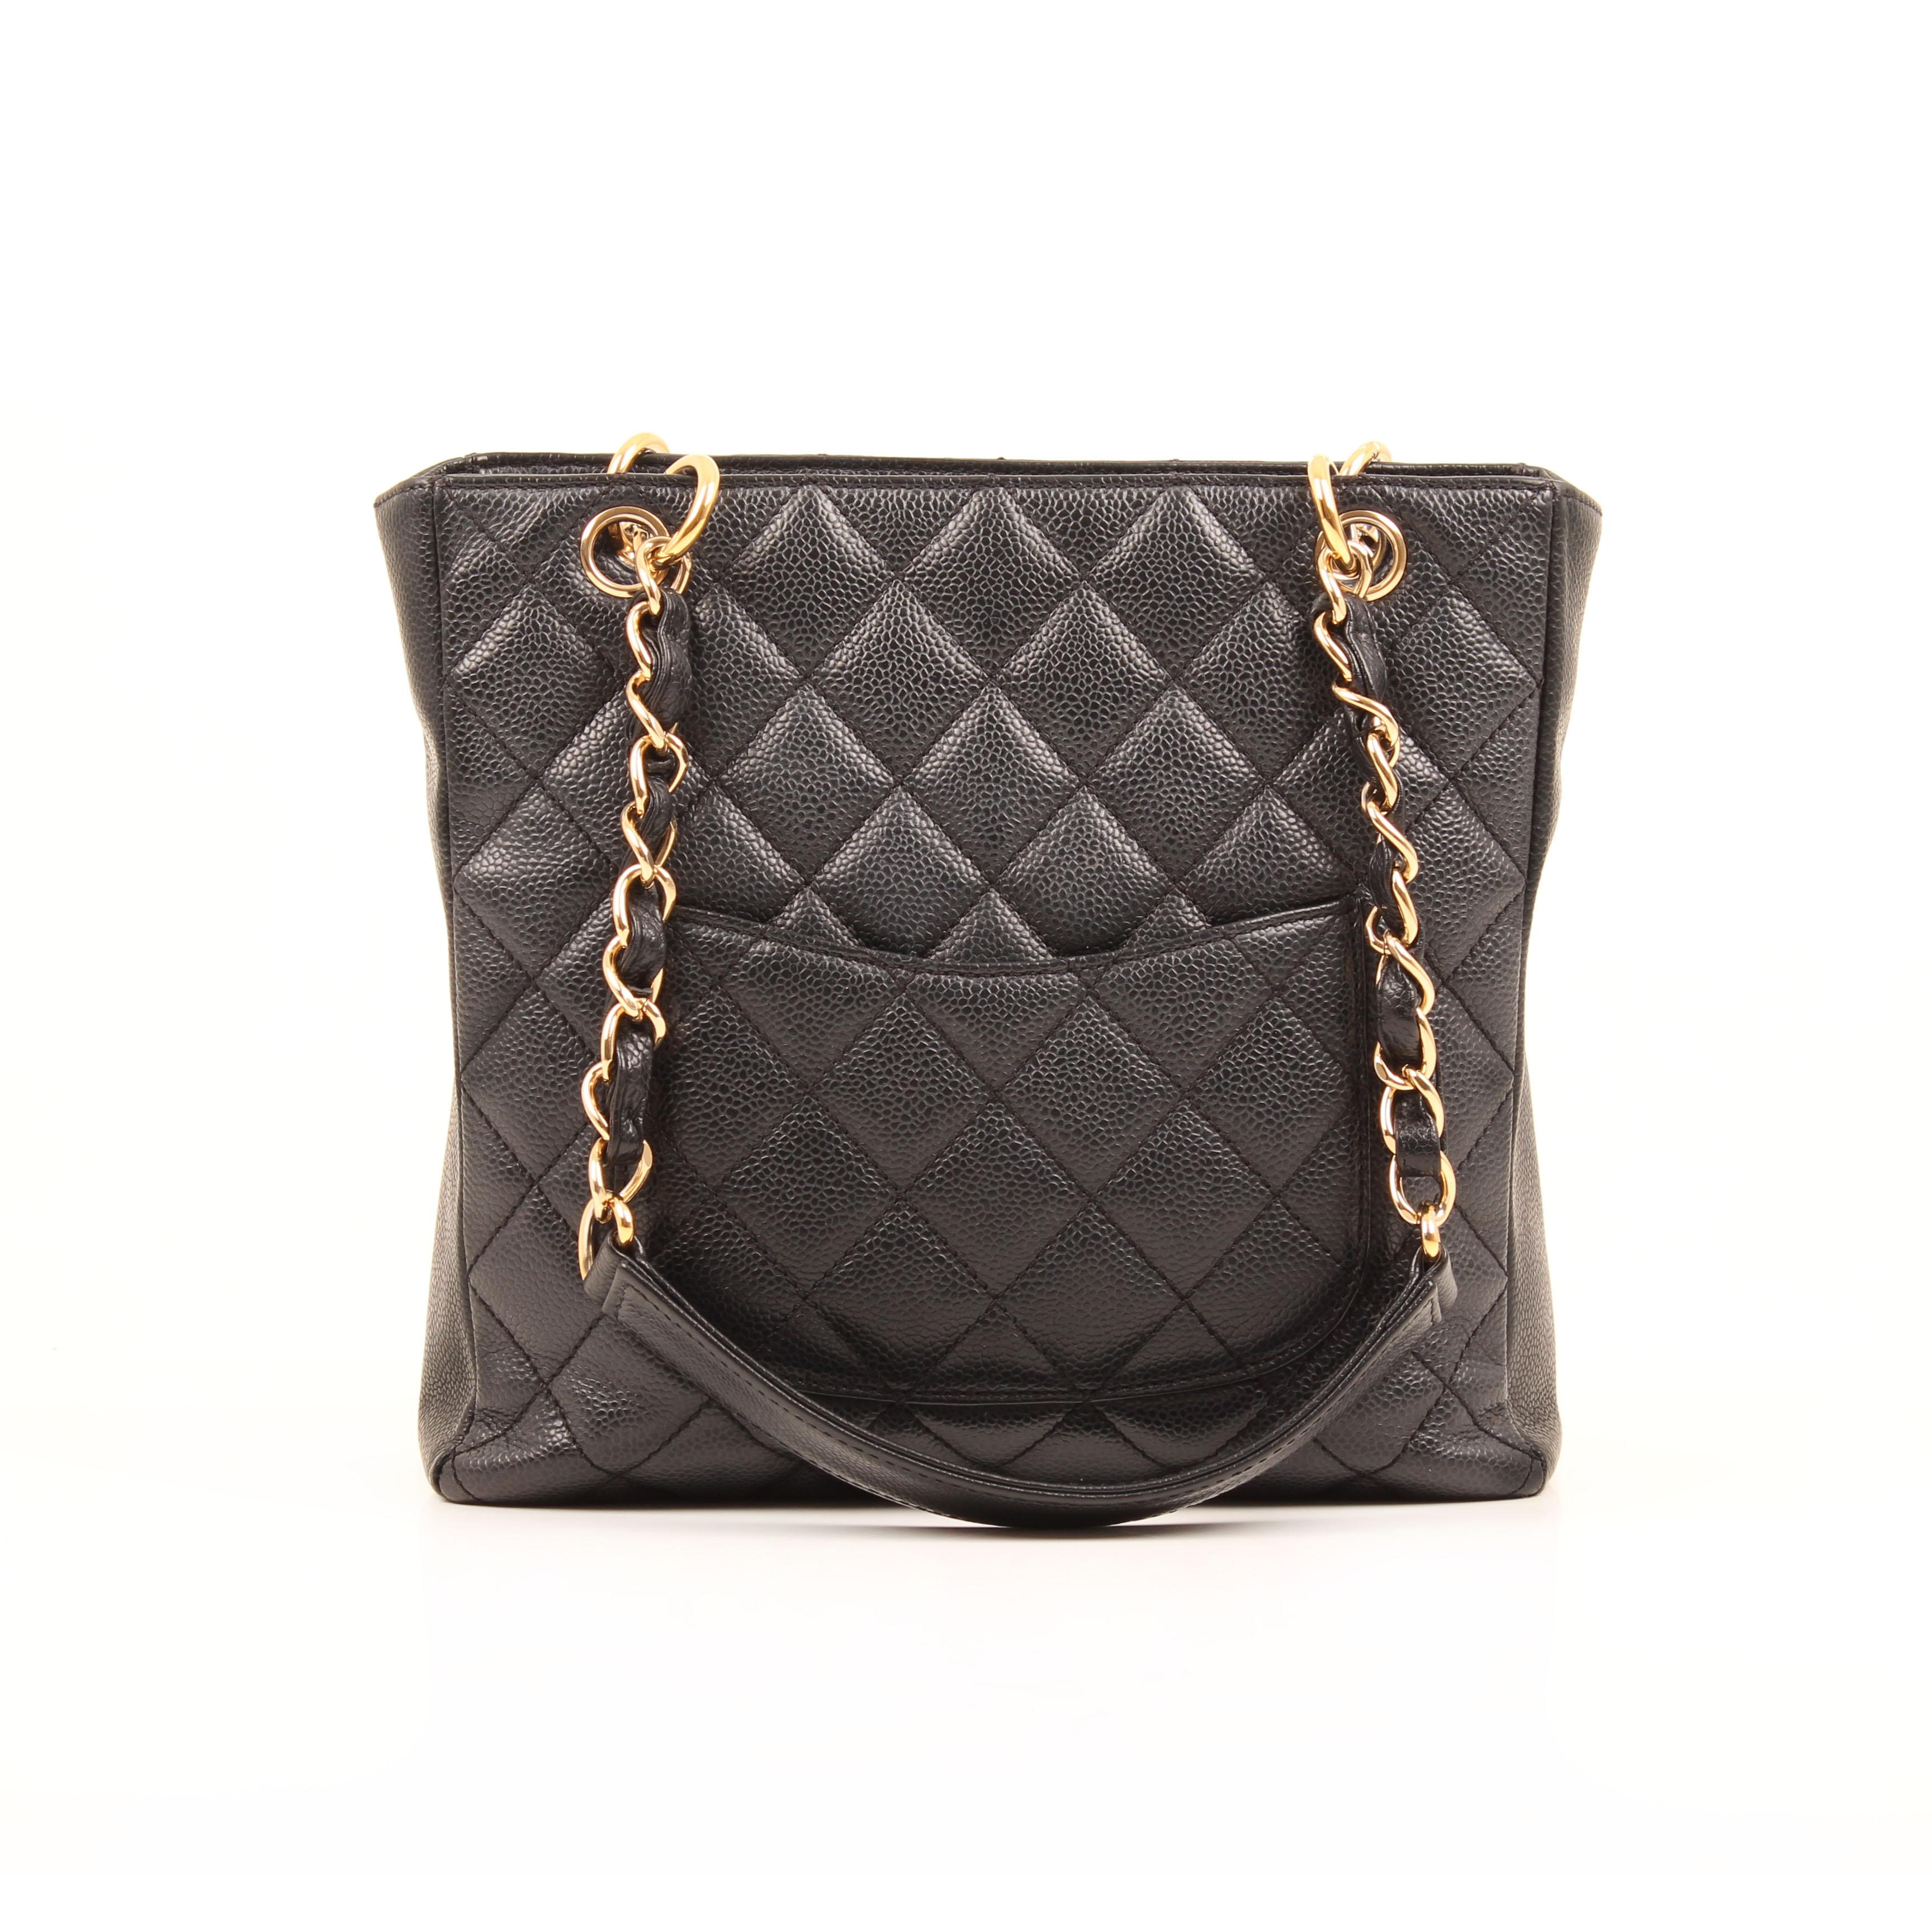 chanel bag shopper tote mini caviar leather black back